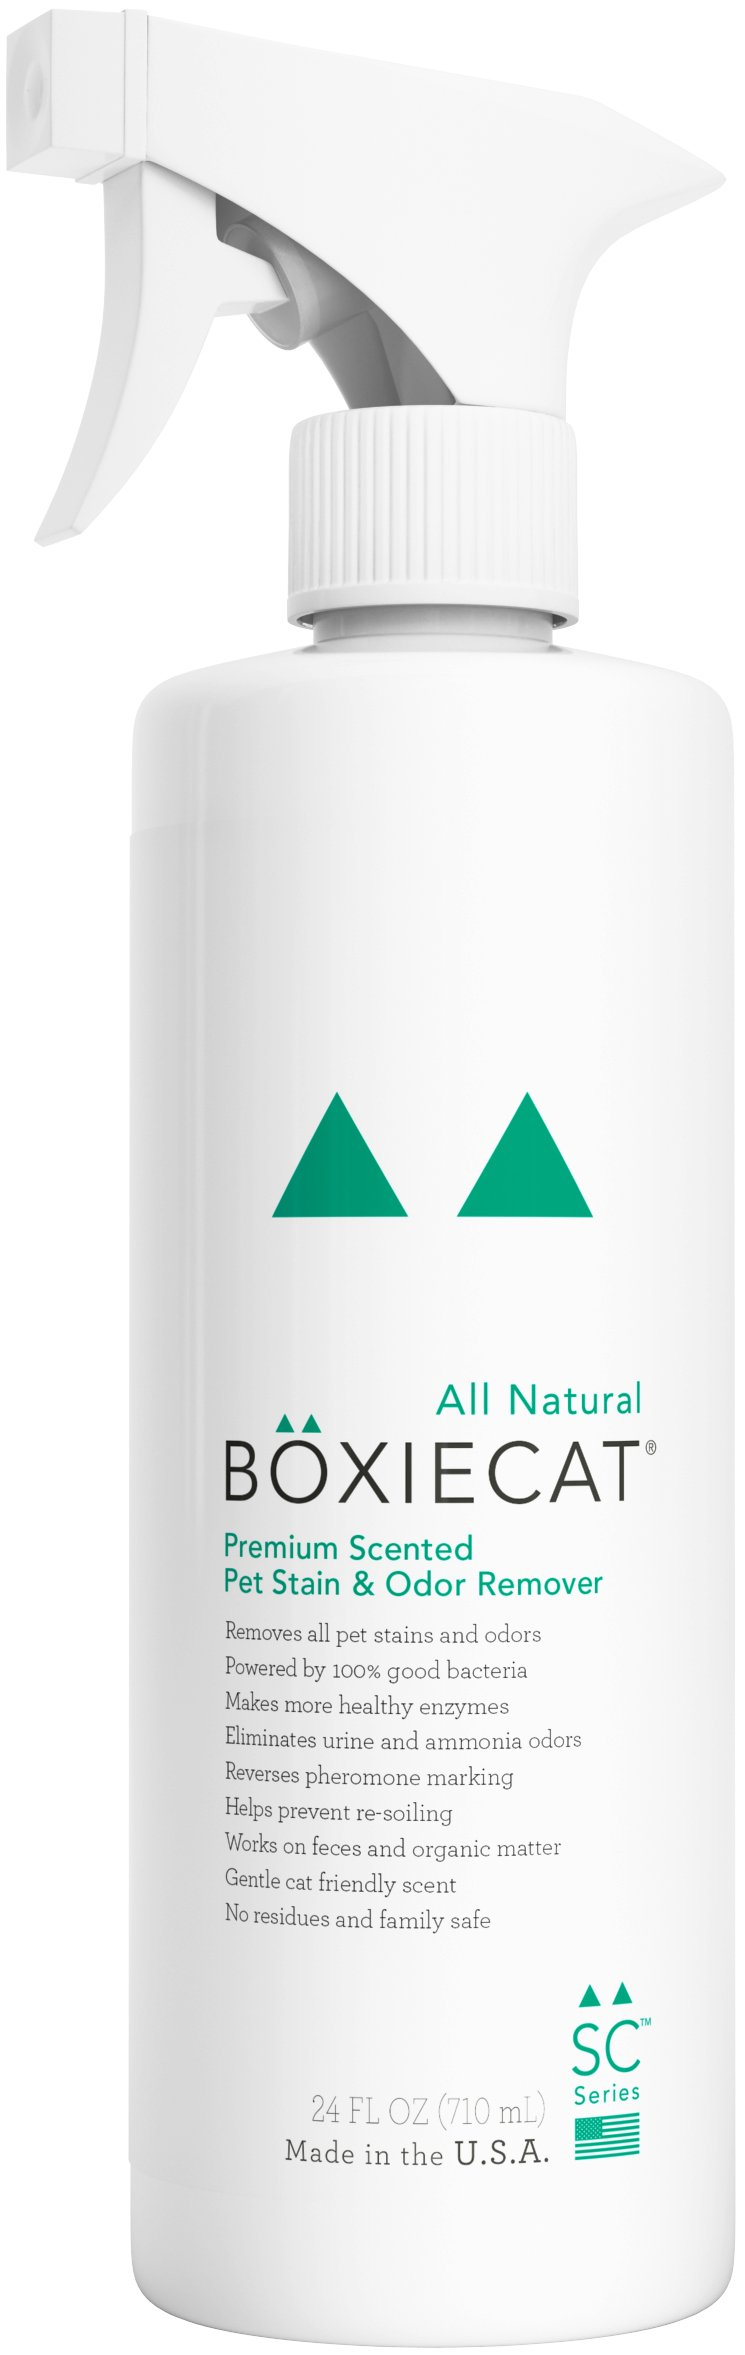 Boxiecat Premium Scented Stain & Odor Remover